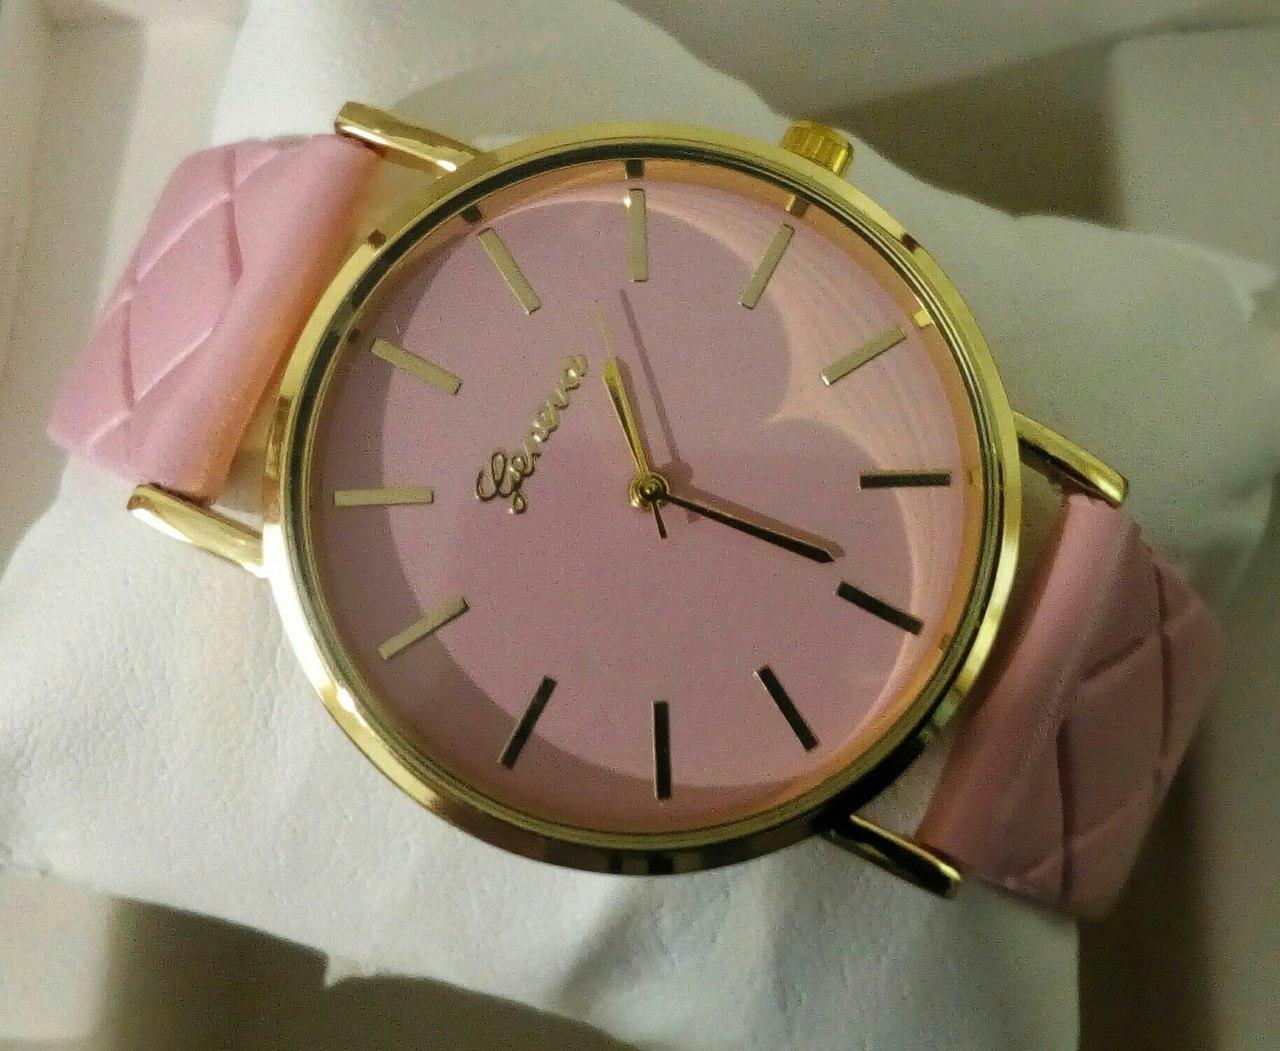 553408d71ec2 Красивые женские часы Geneva - BestShopping96